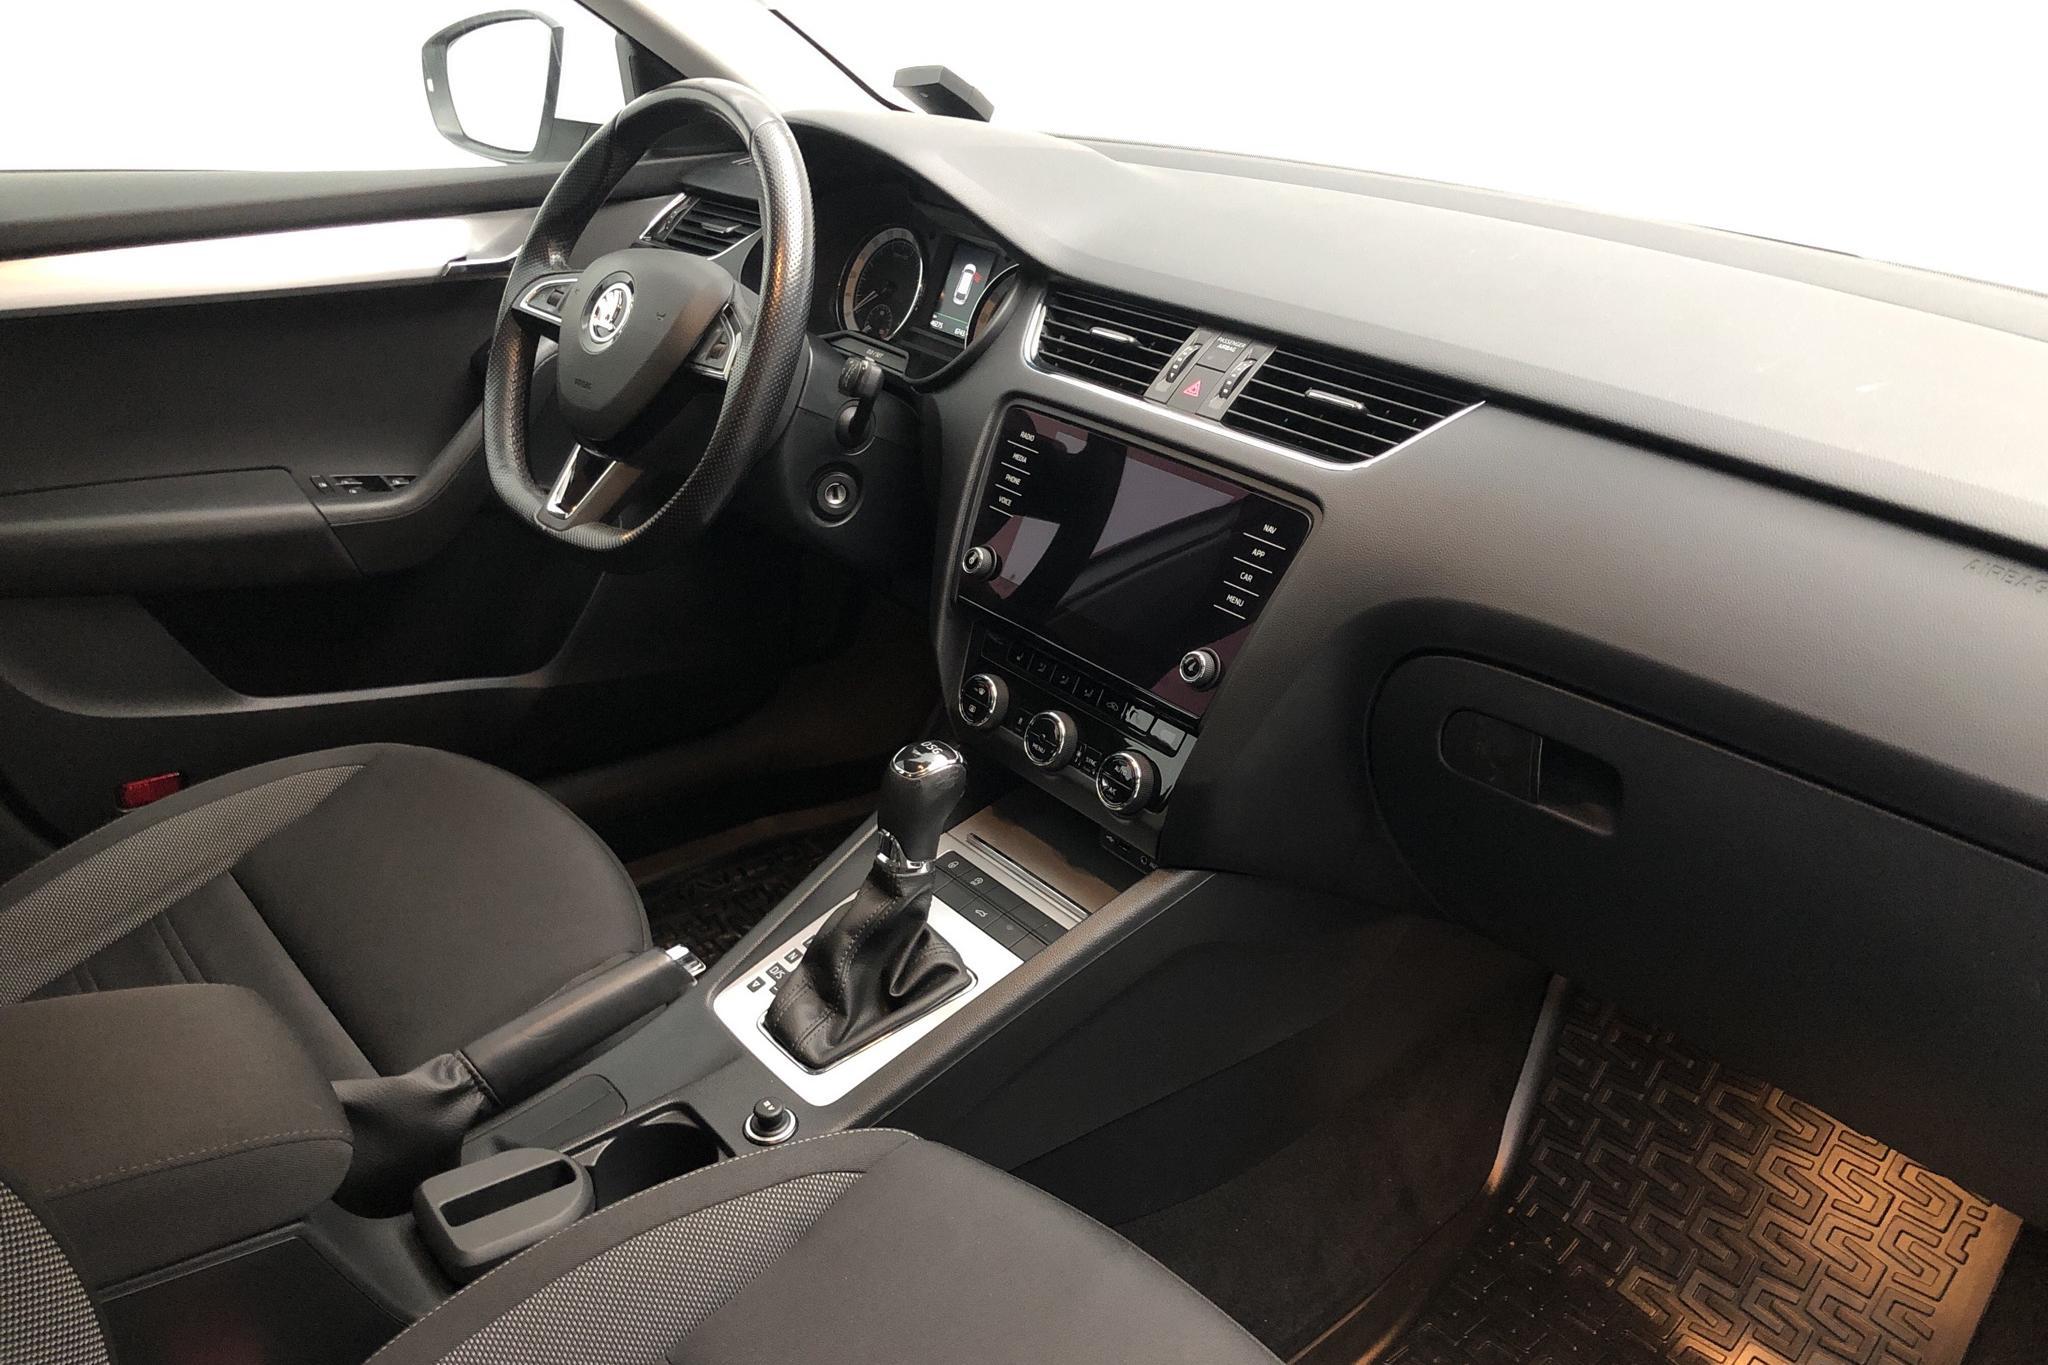 Skoda Octavia III 1.6 TDI Combi (115hk) - 46 270 km - Automatic - white - 2018